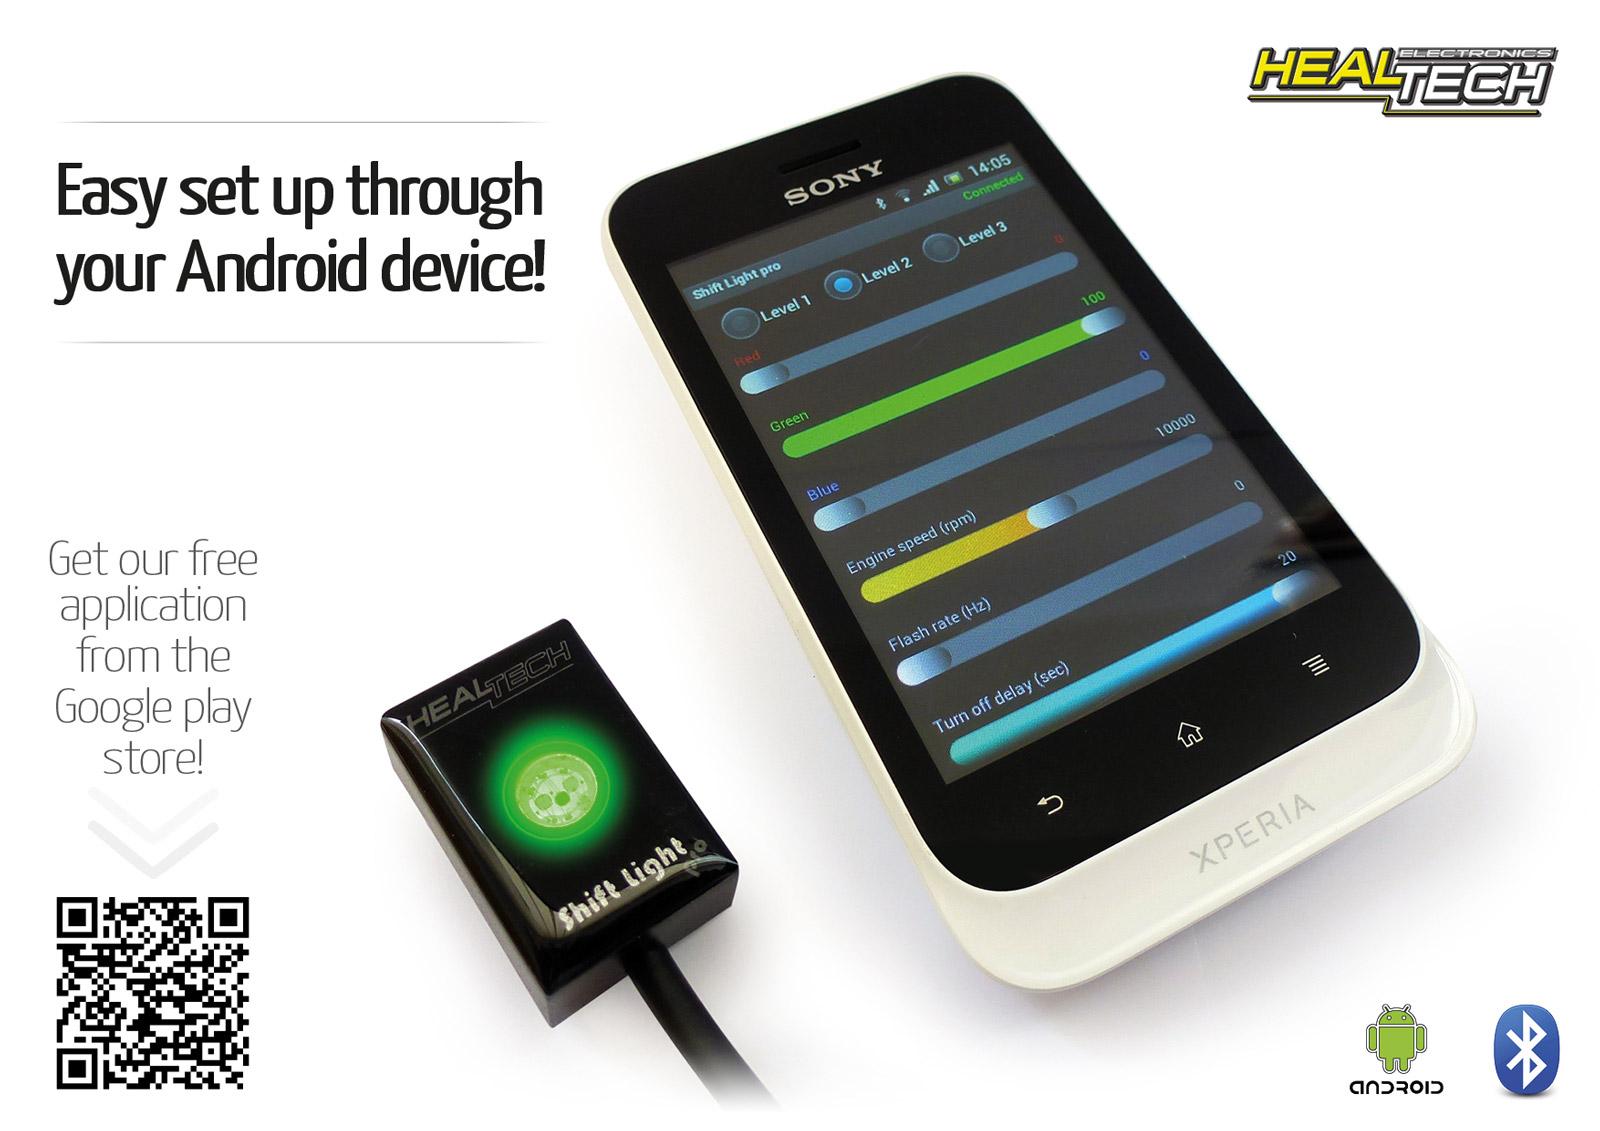 HealTech Schaltblitz Shiftlight pro universal